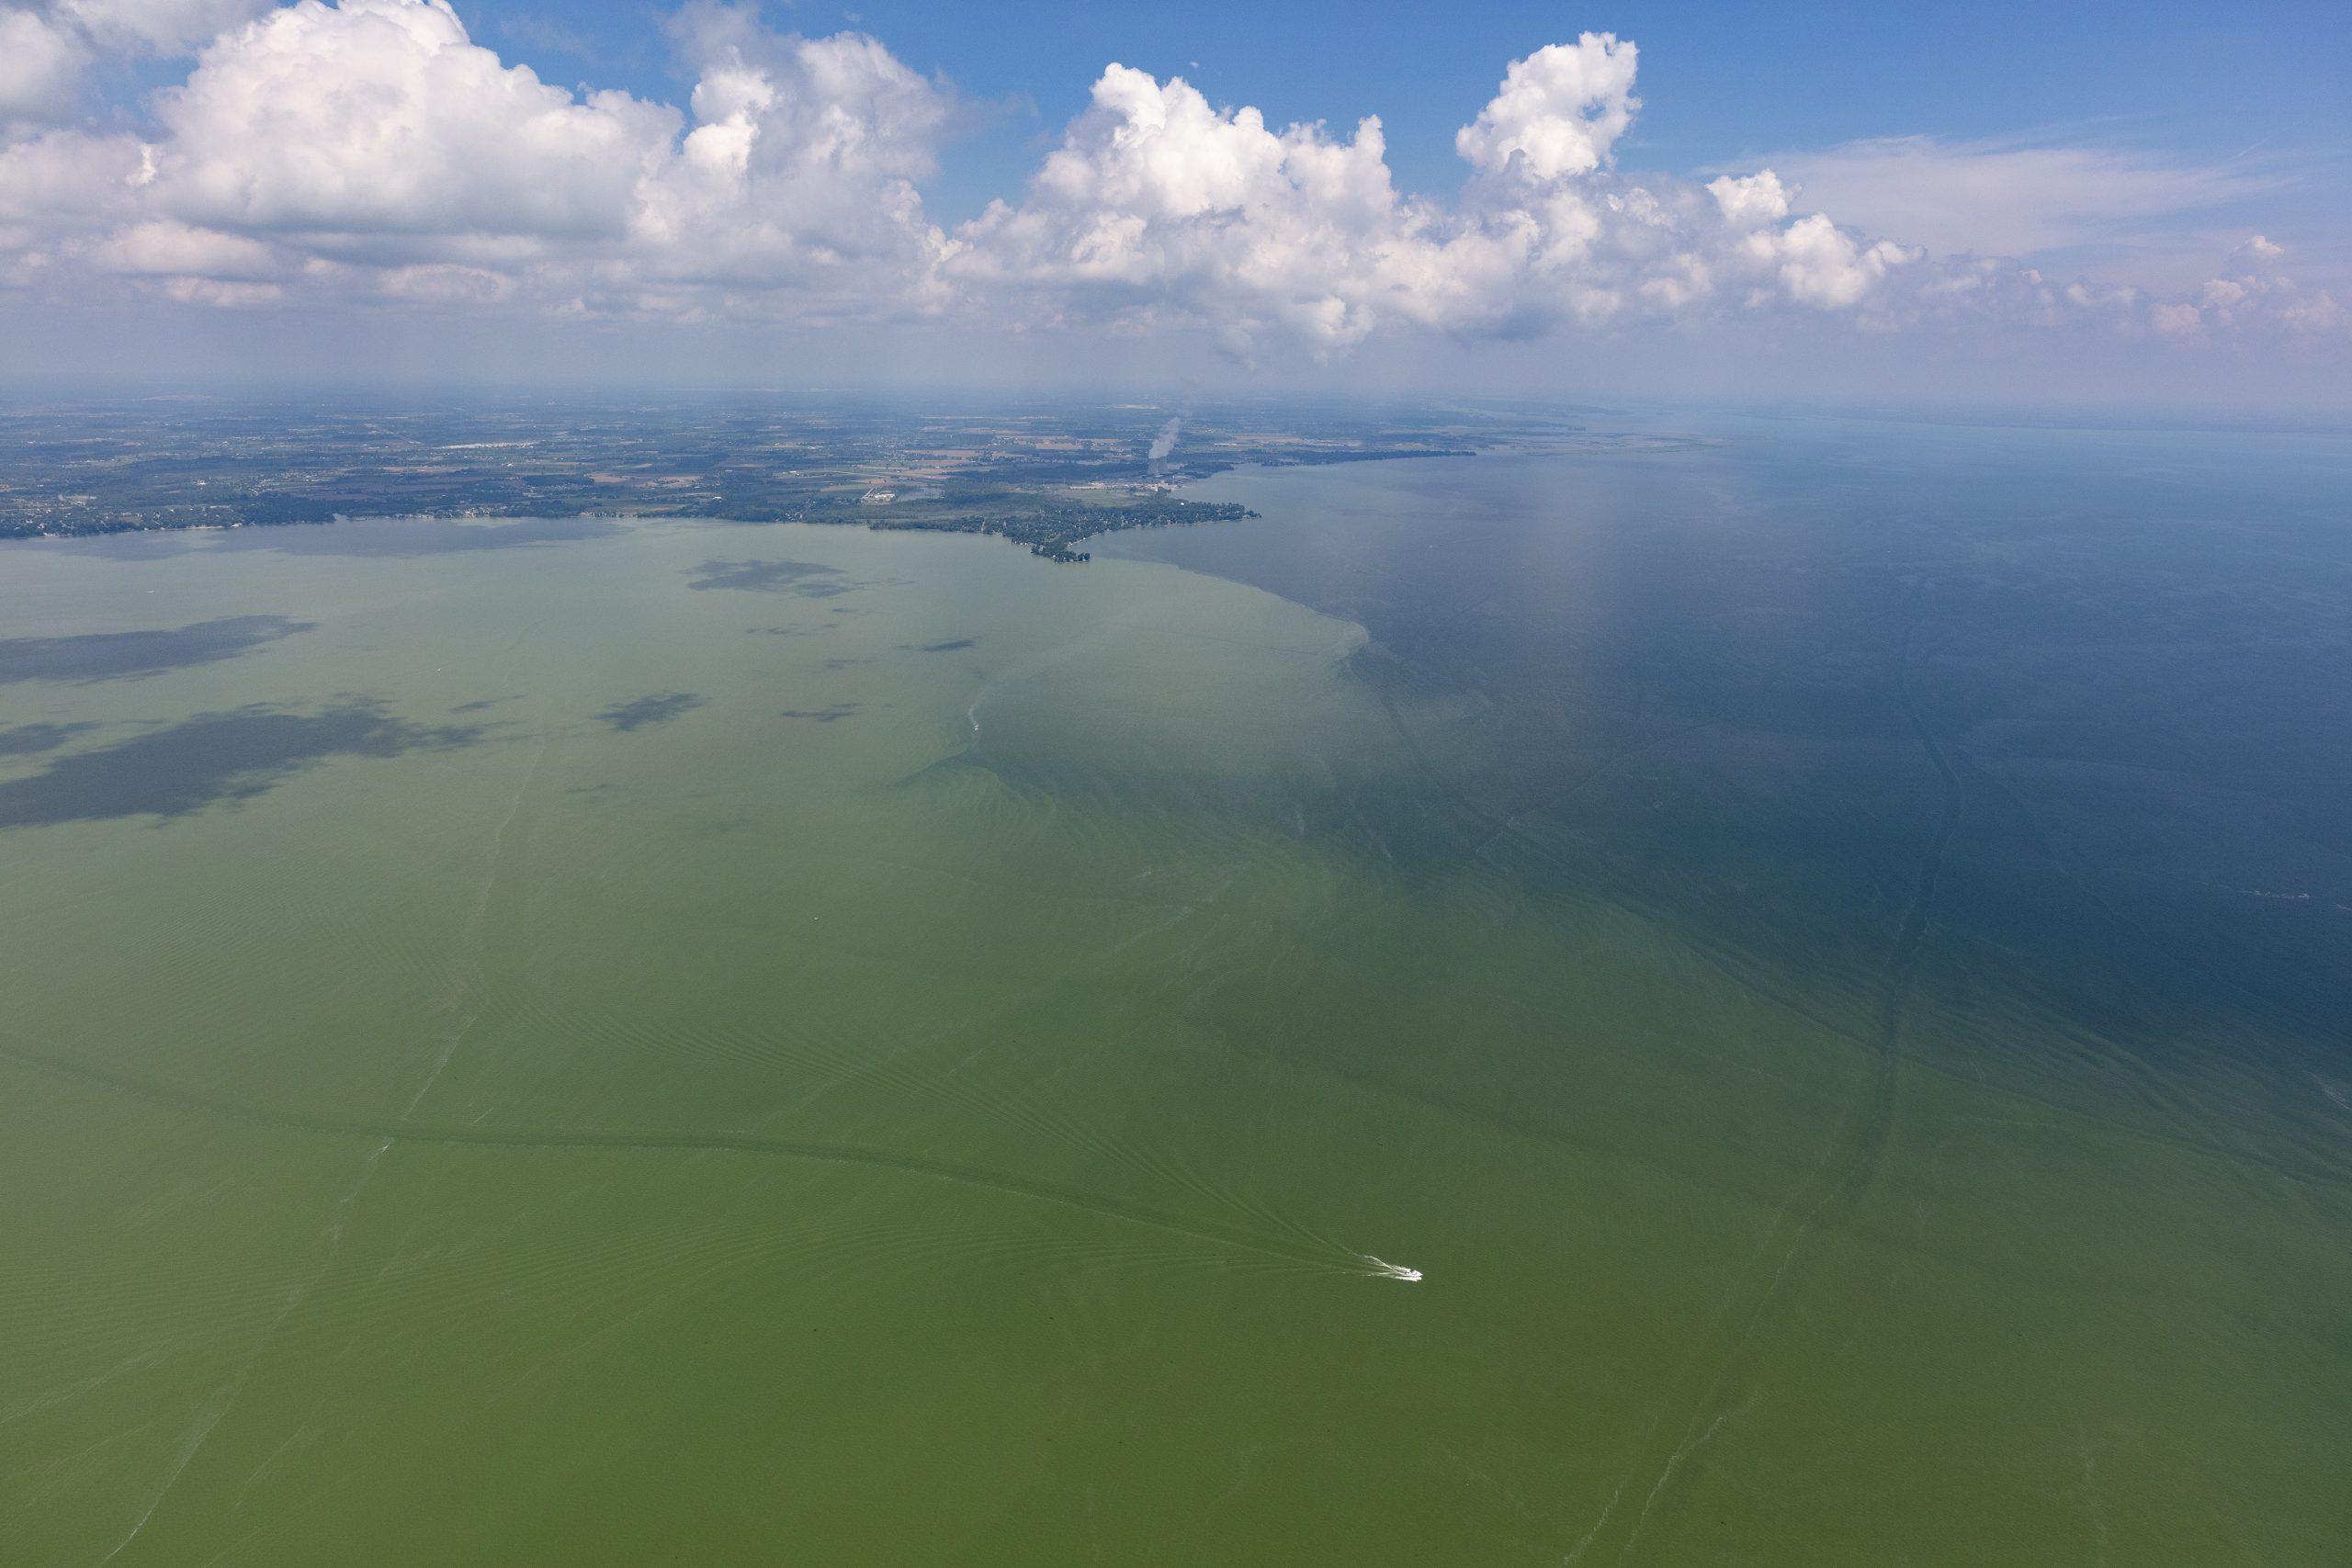 Smaller Harmful Algal Bloom Predicted for Western Lake Erie in Summer 2021